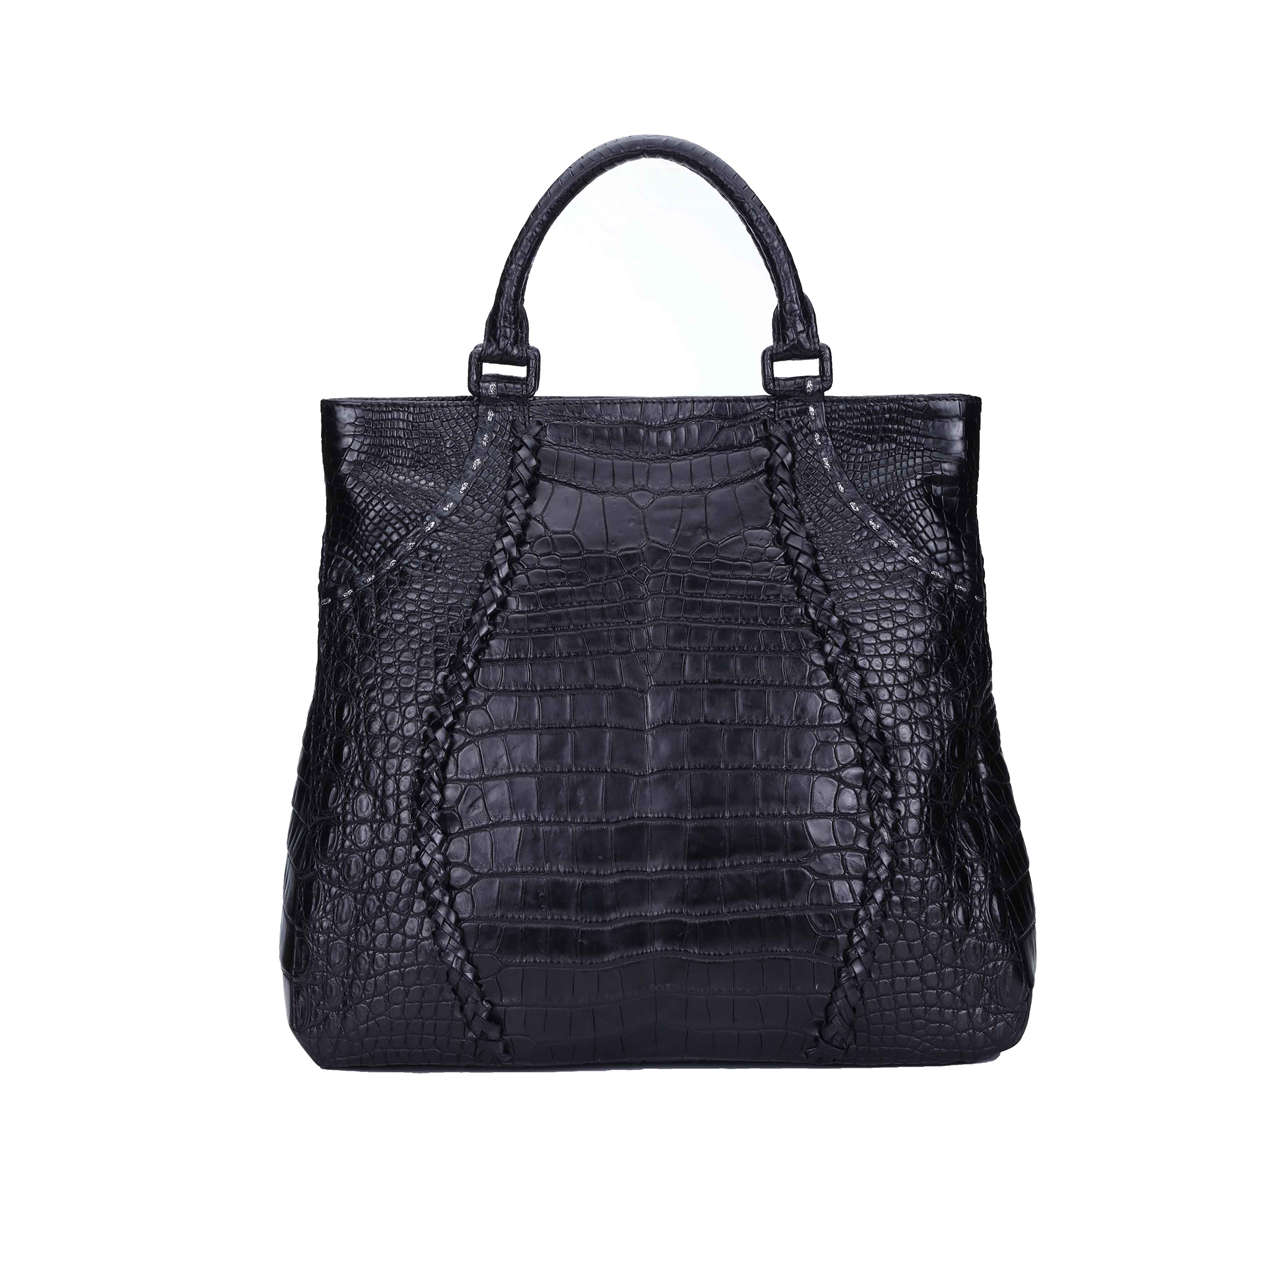 GF bags-Custom Latest Handbags Manufacturer, Cheap Handbags Online | Handbag